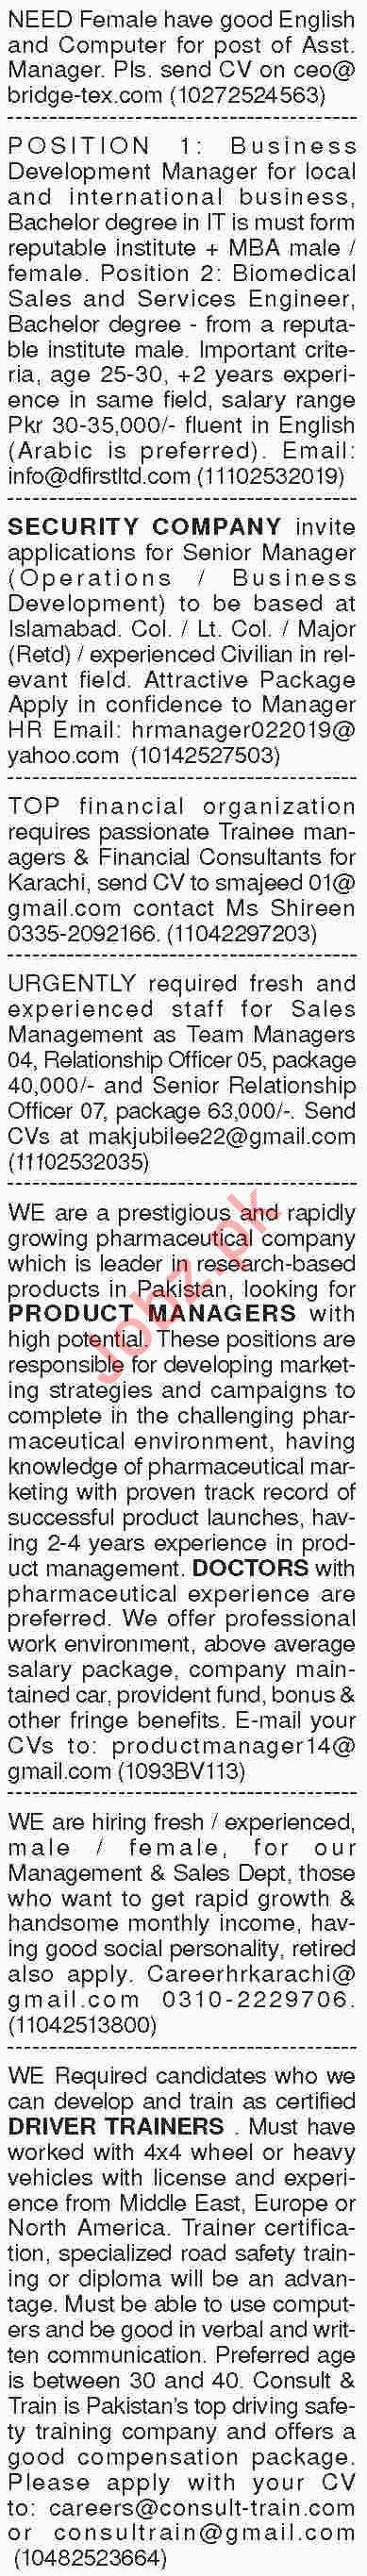 Dawn Sunday Classified Ads 10th Feb 2019 Management Staff